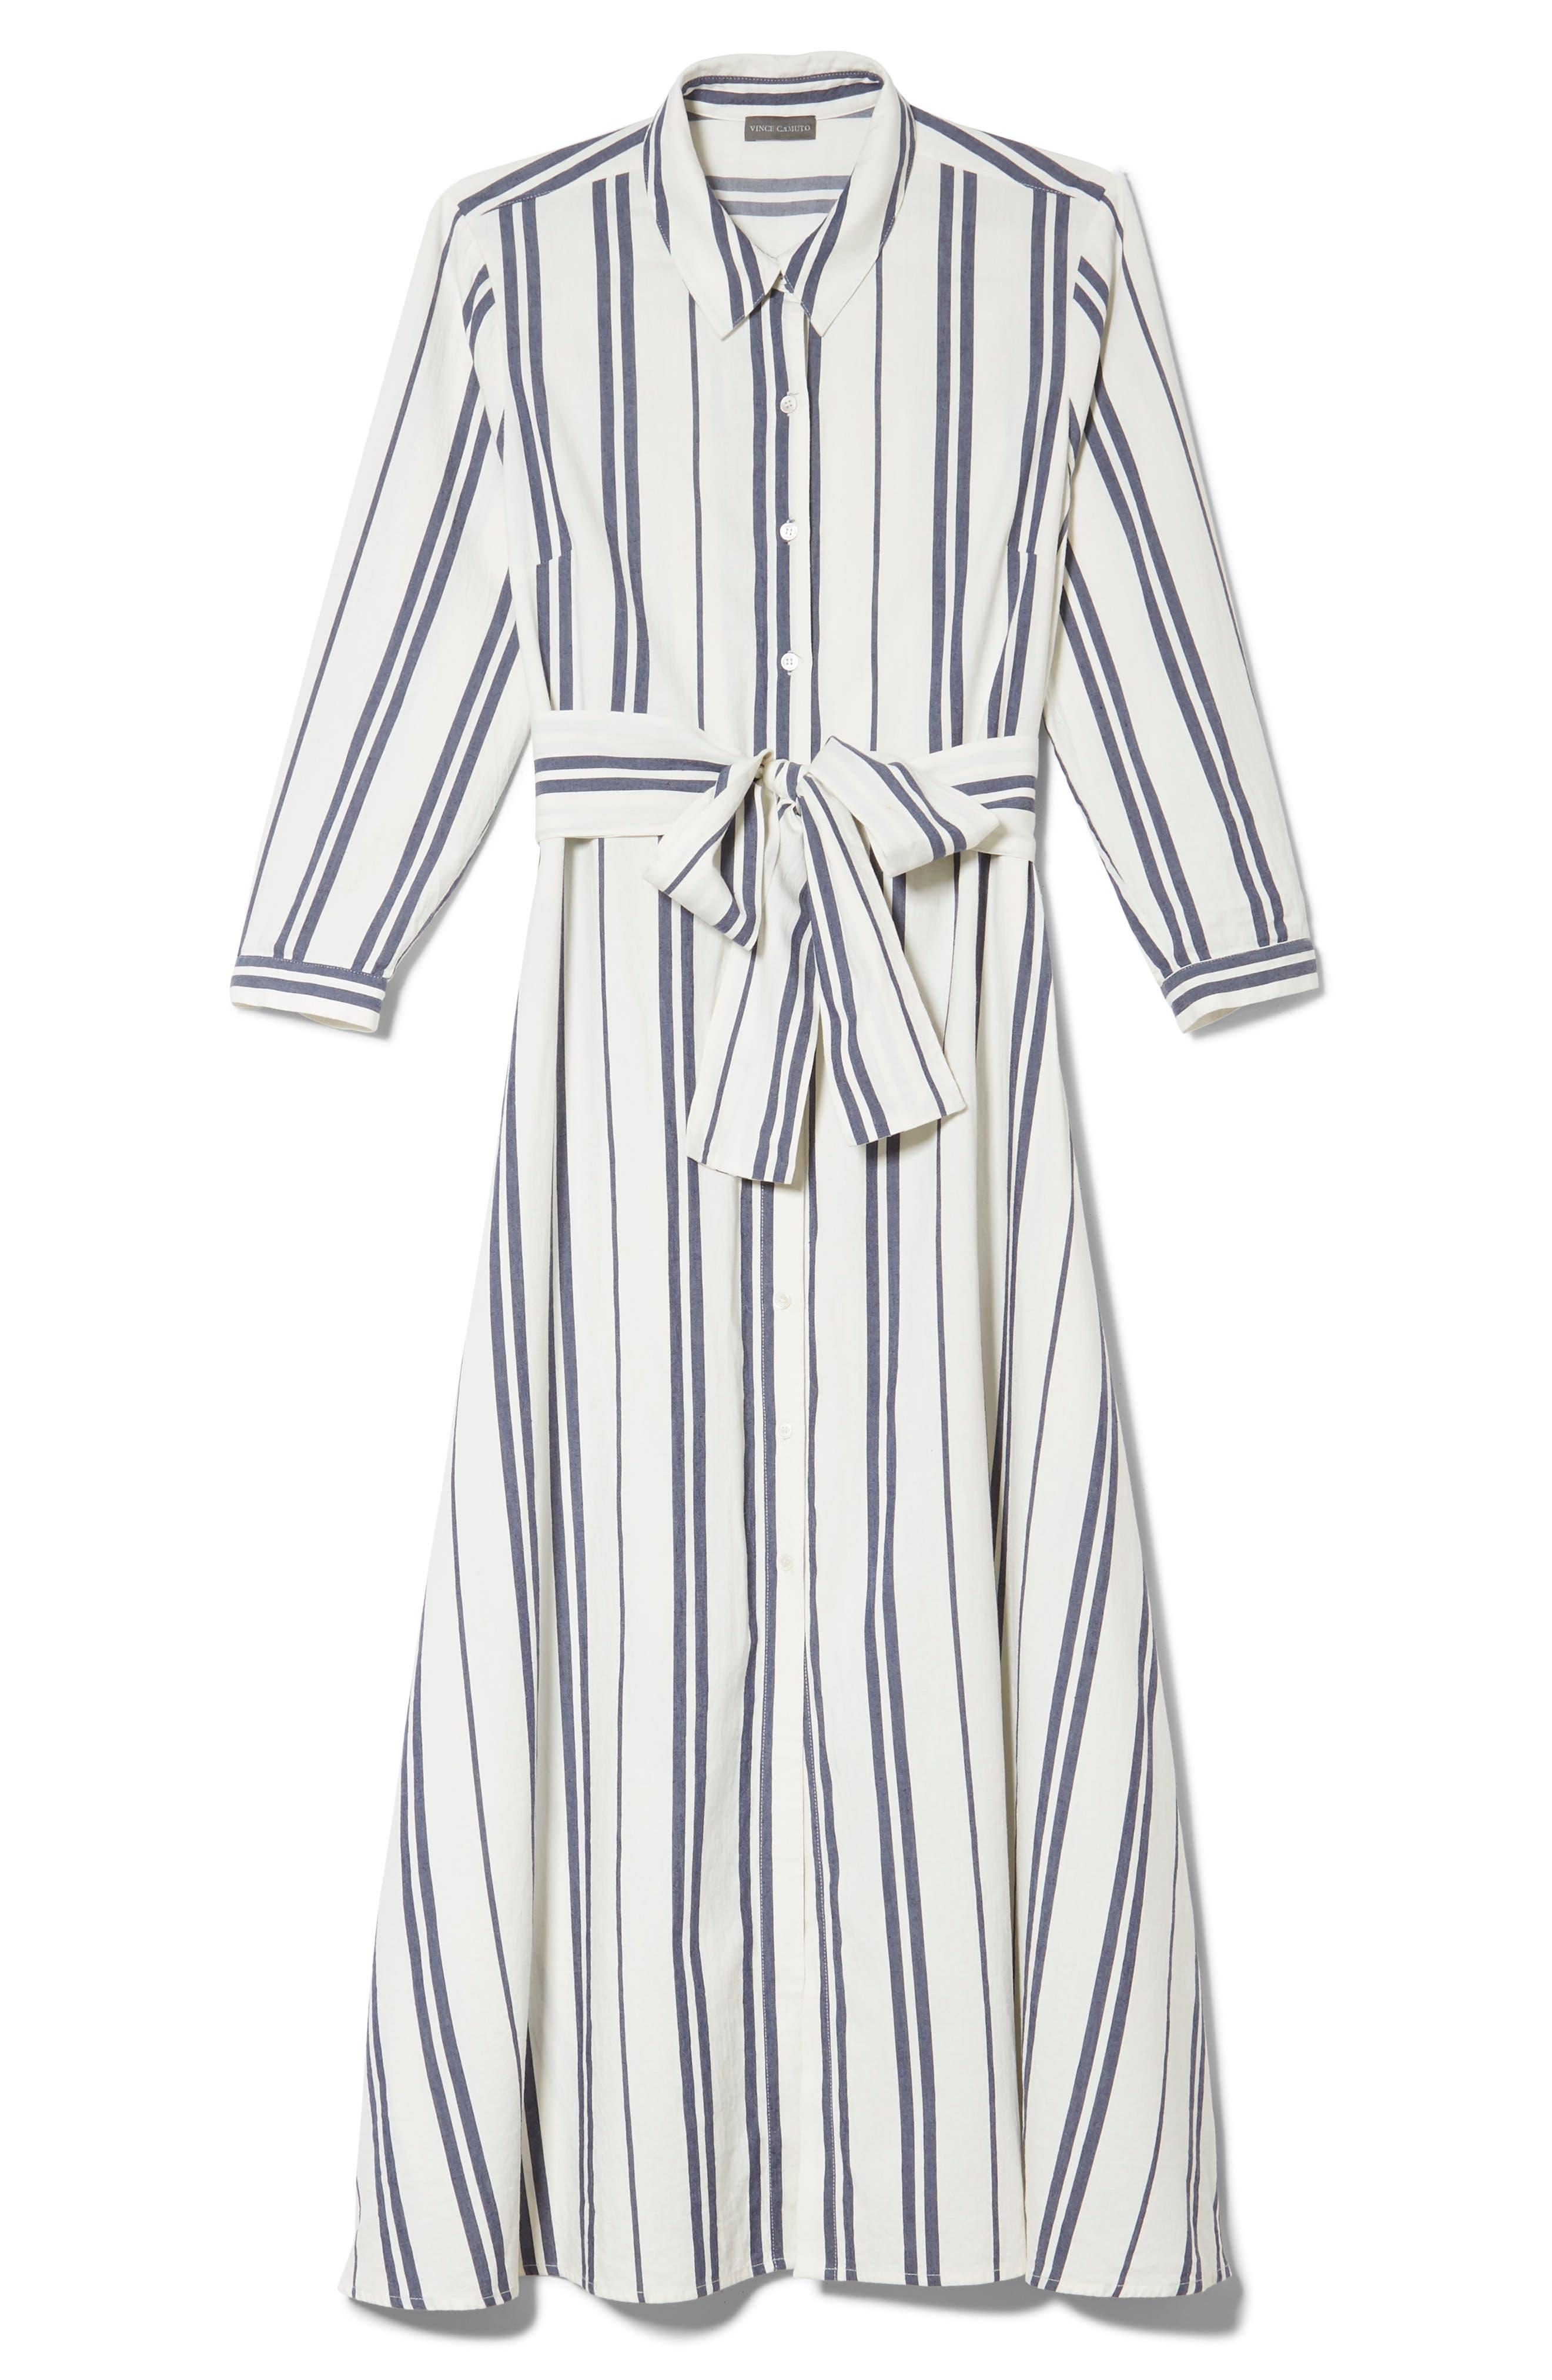 VINCE CAMUTO, Valiant Stripe Midi Shirtdress, Alternate thumbnail 3, color, PEARL IVORY